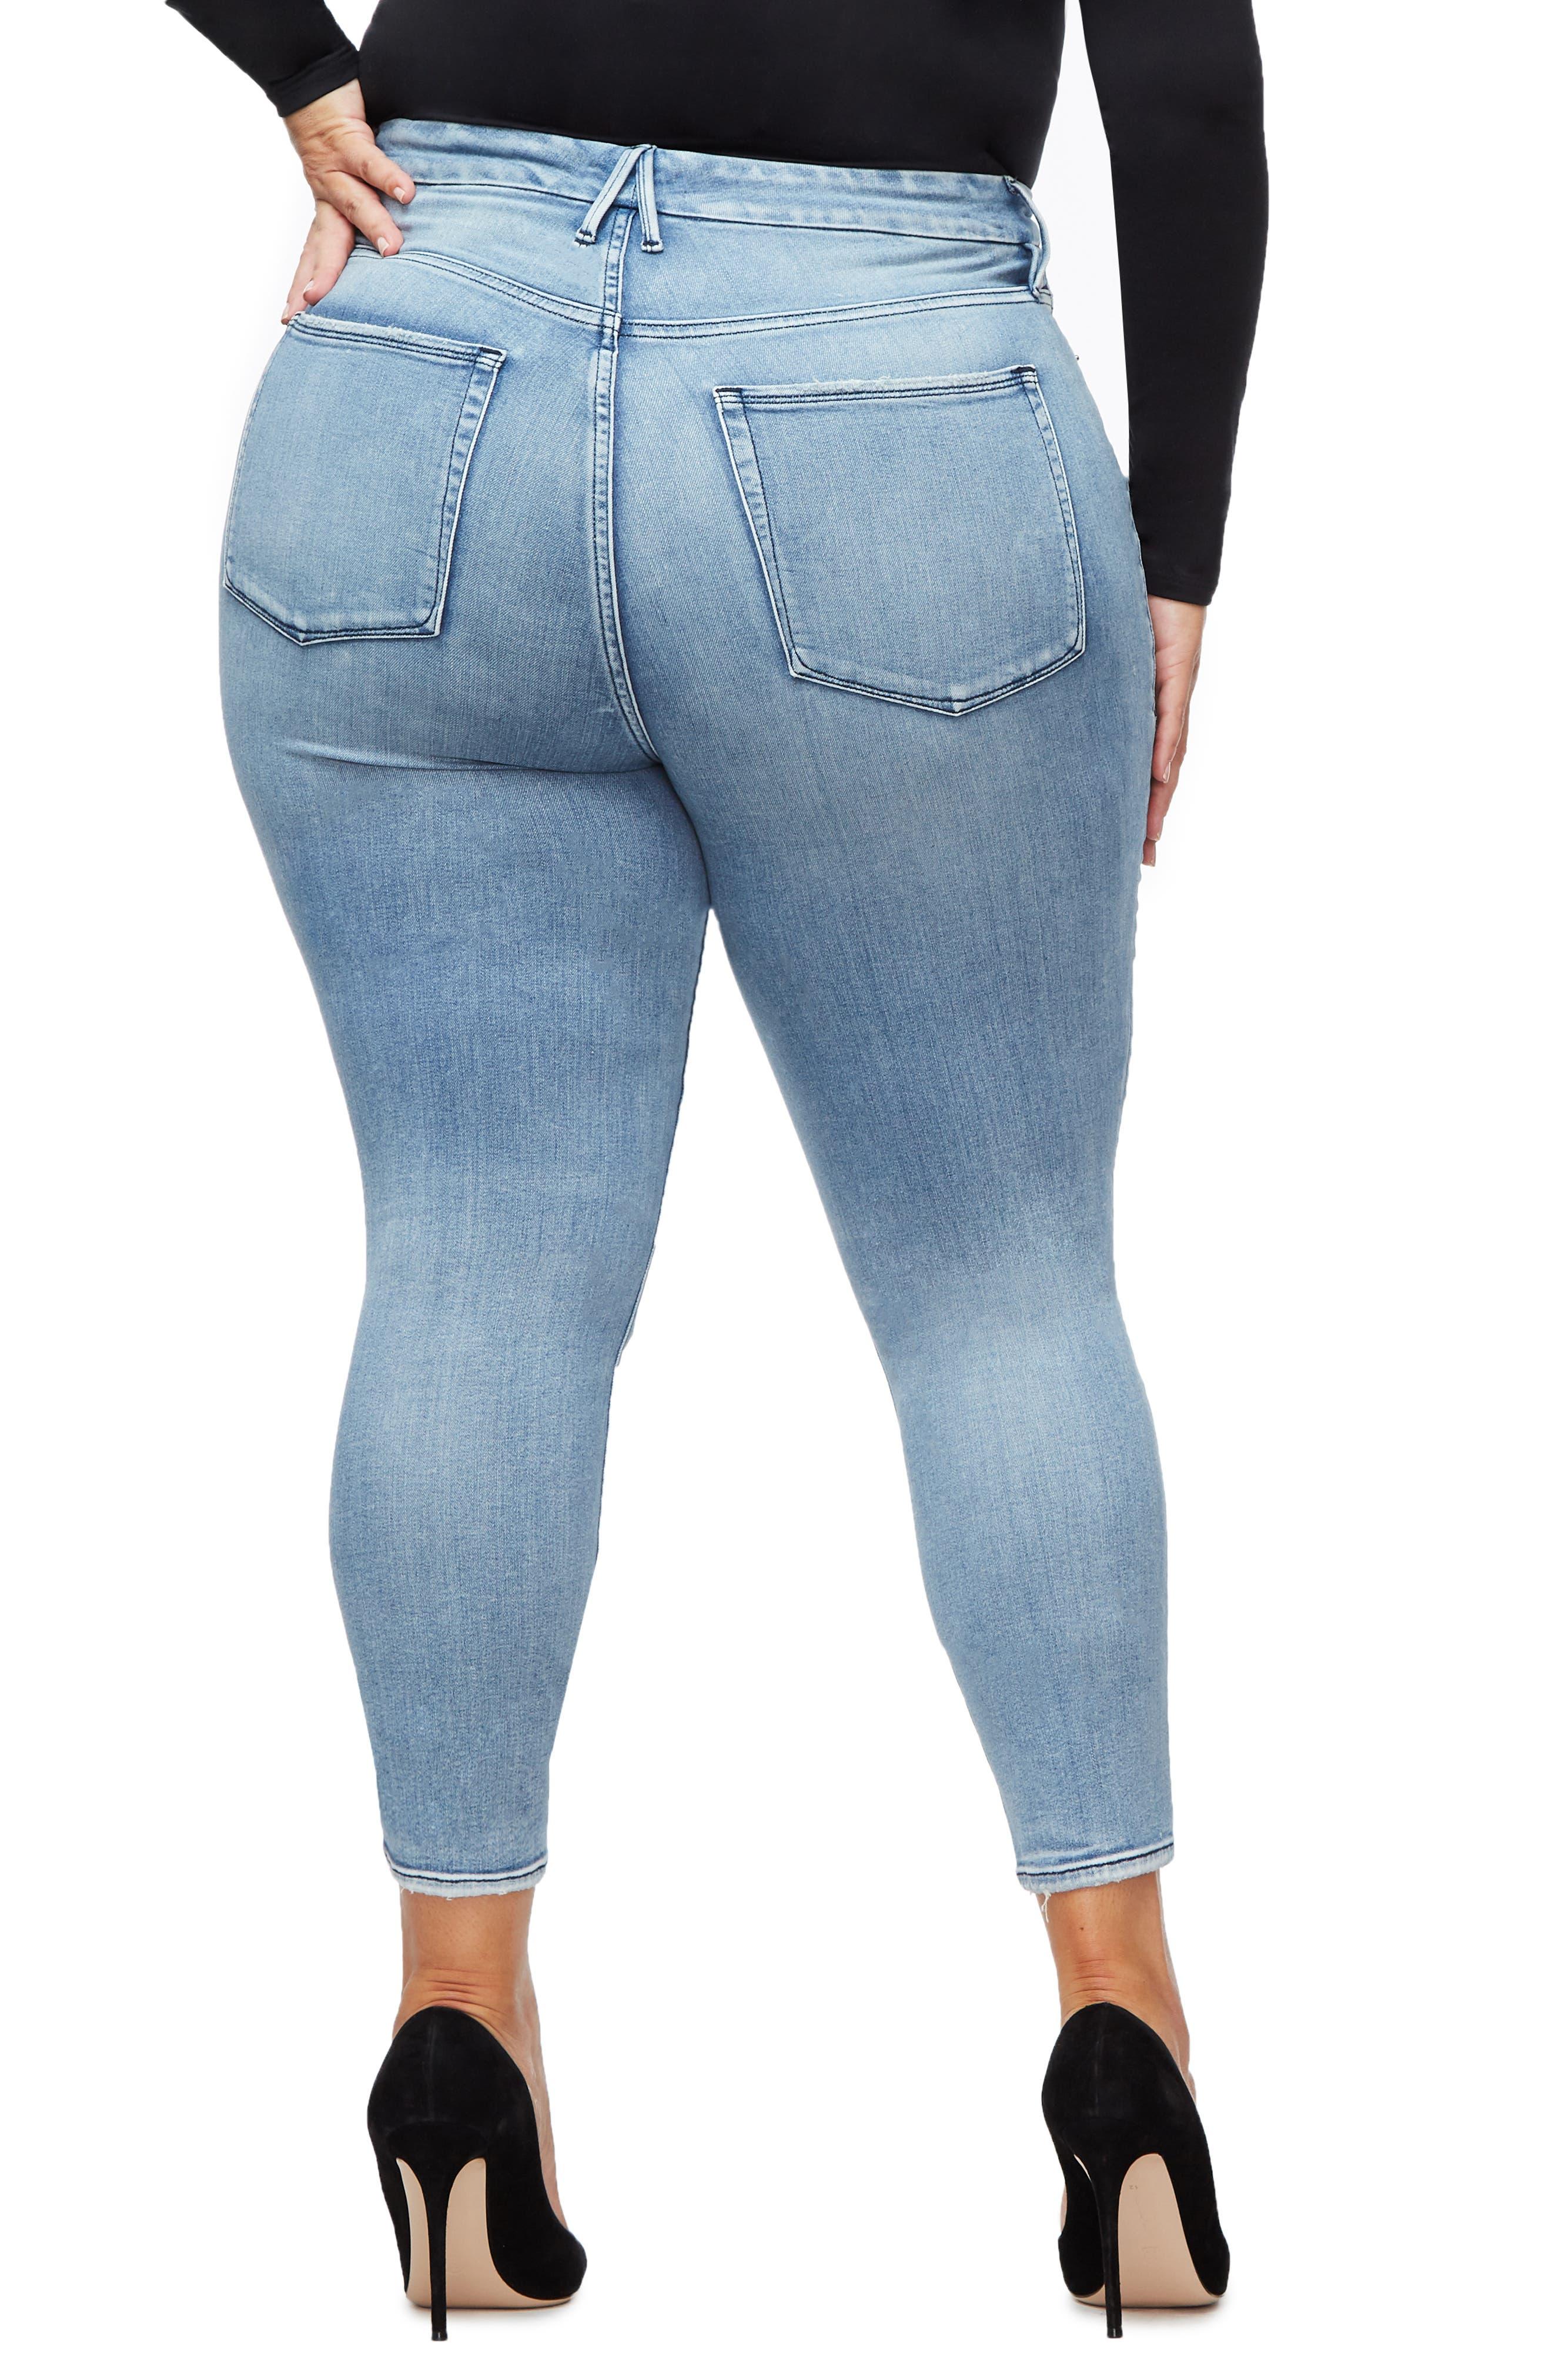 GOOD AMERICAN, Good Waist Ripped High Waist Crop Skinny Jeans, Alternate thumbnail 4, color, BLUE250